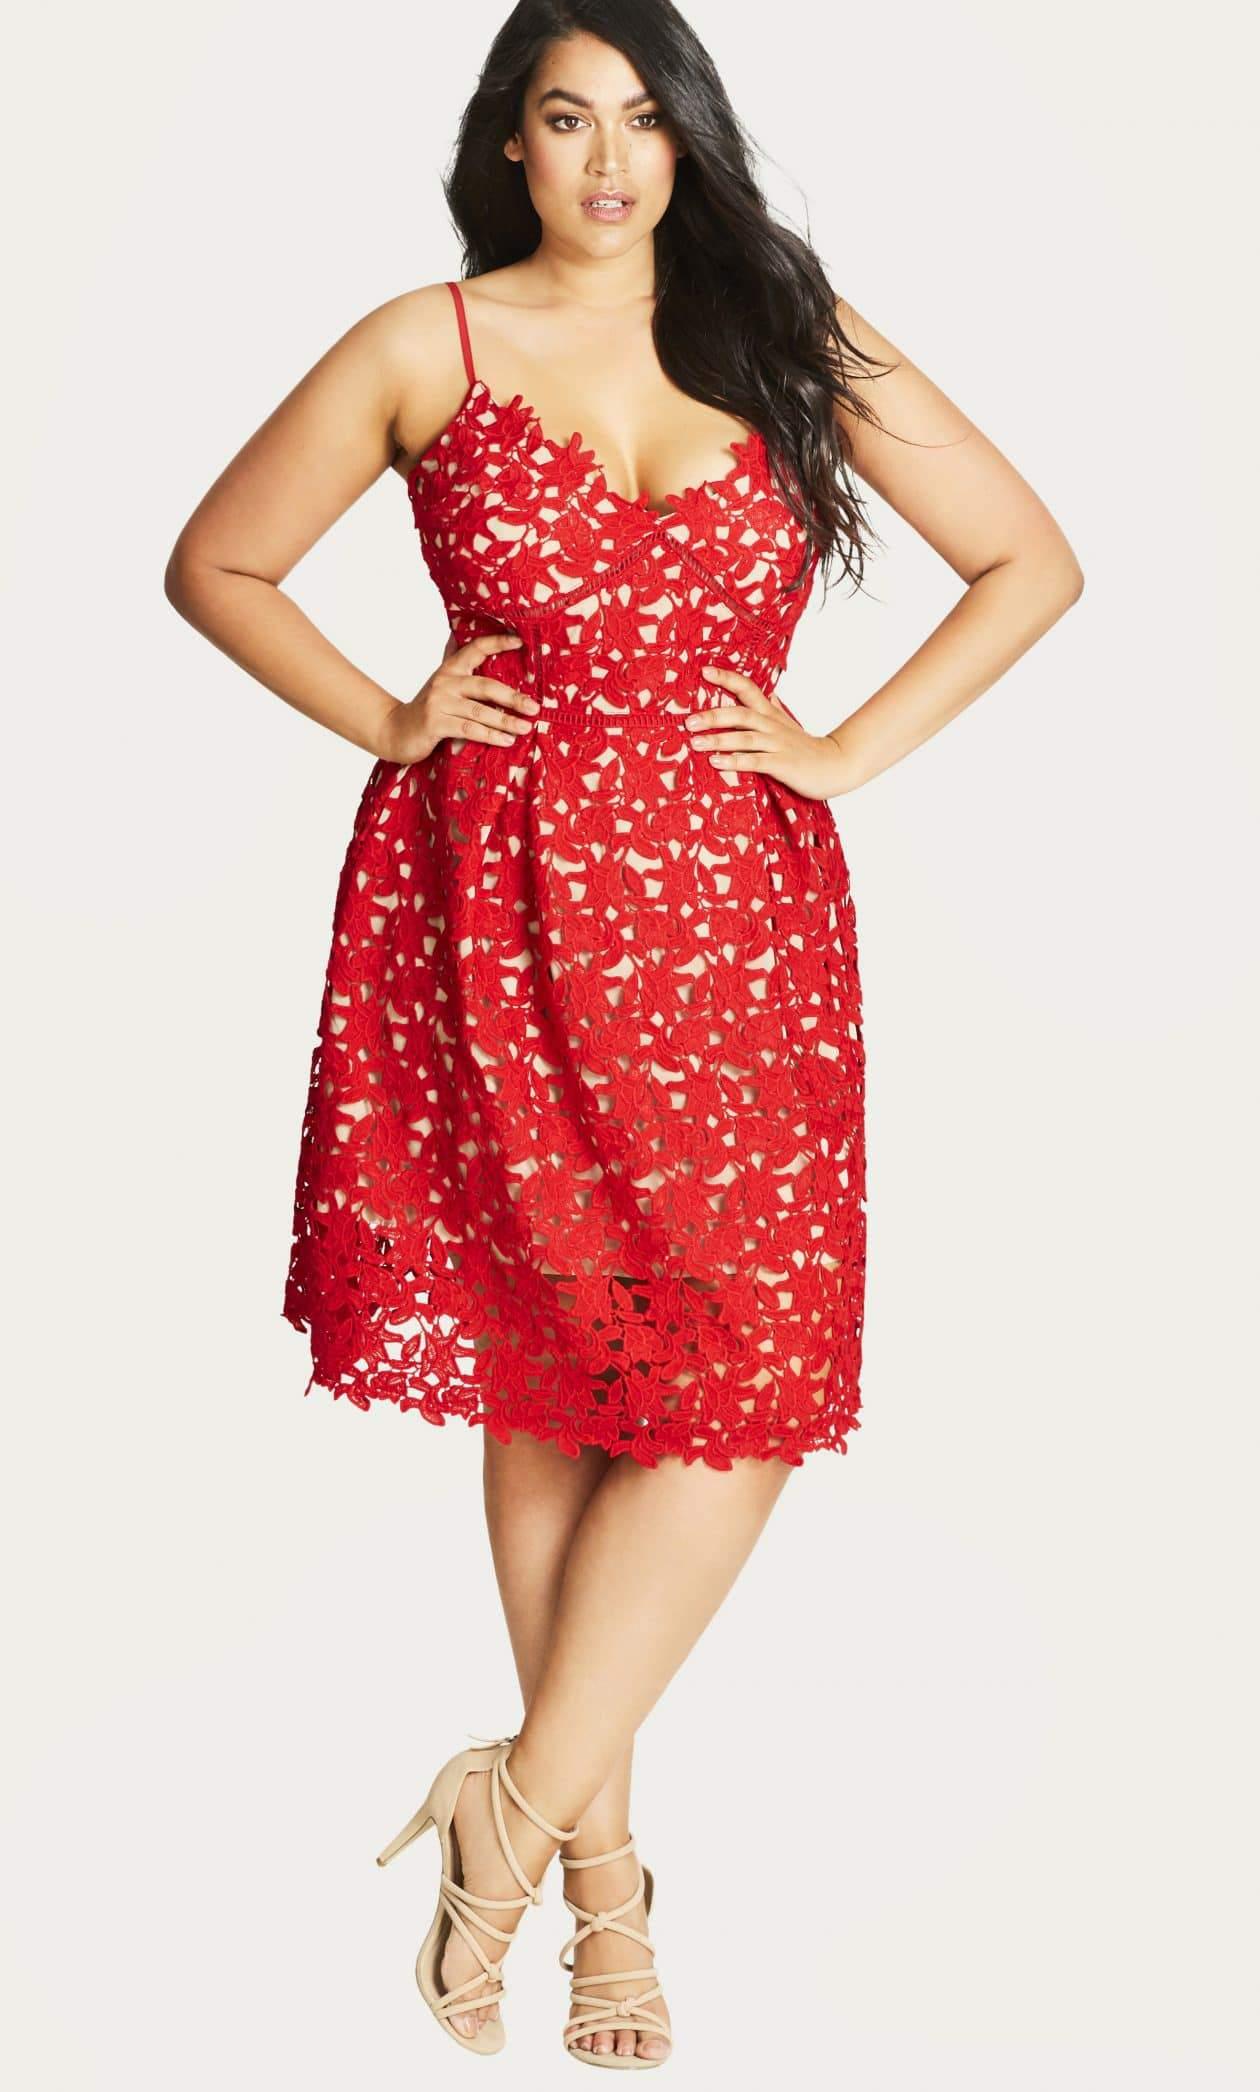 So Fancy Scarlet Crochet Fit Flare Dress at CityChicOnline